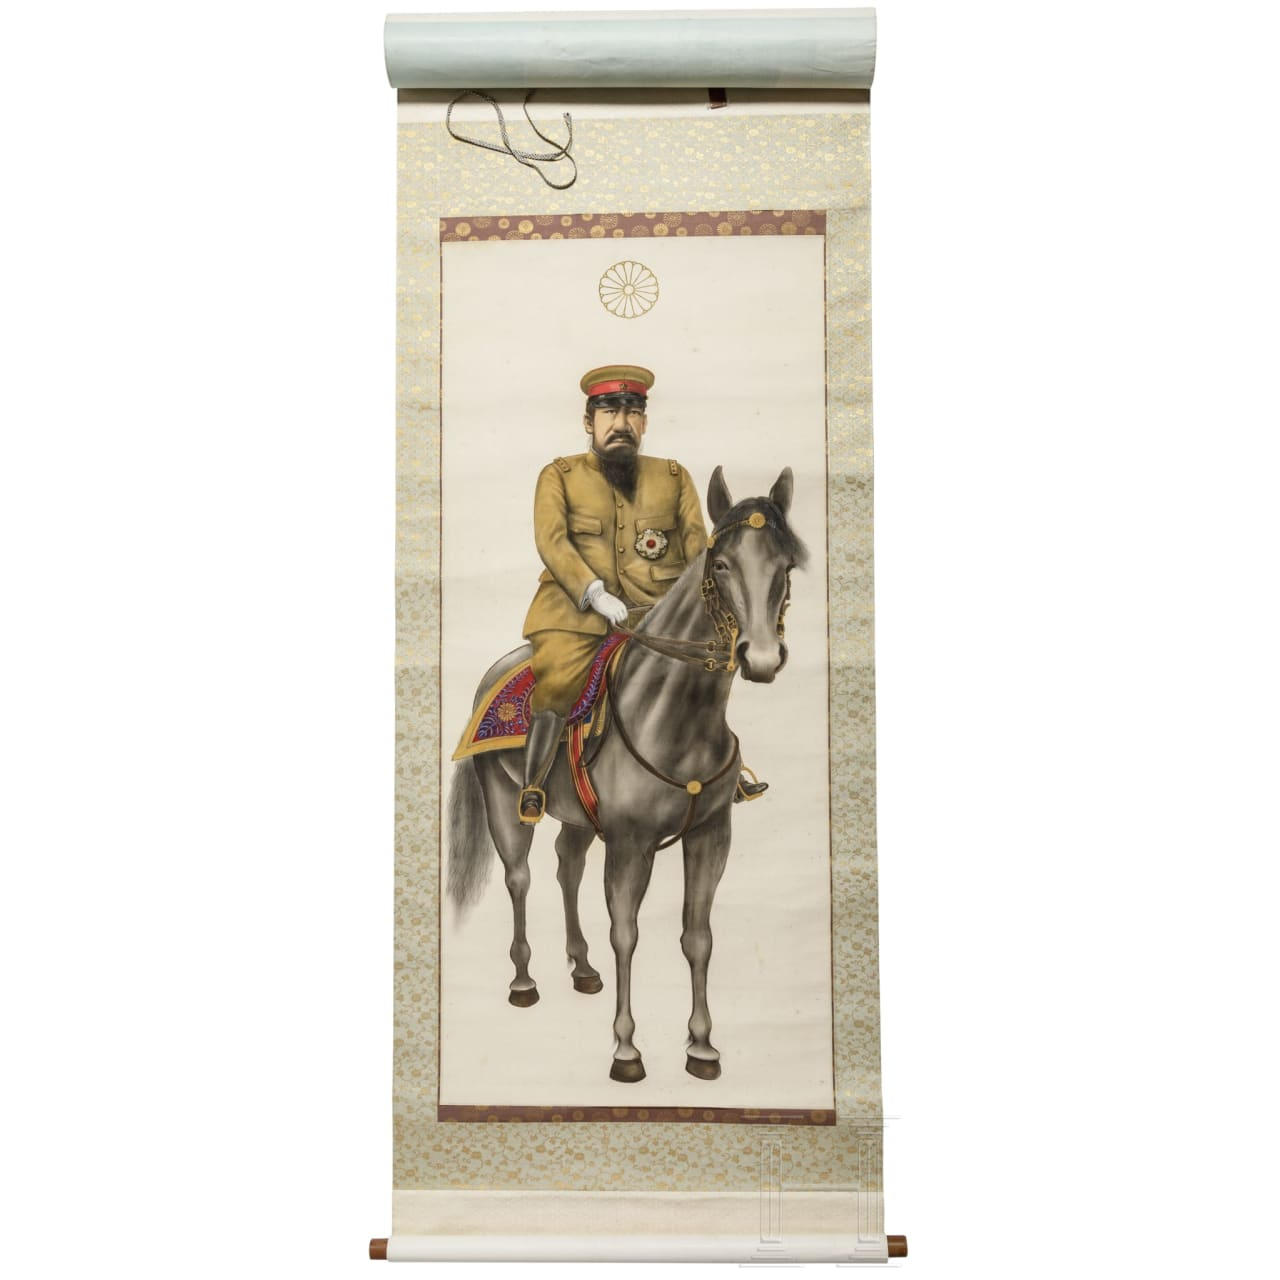 Japan - Rollbild des Kaisers Mutsuhito, Meiji-Periode